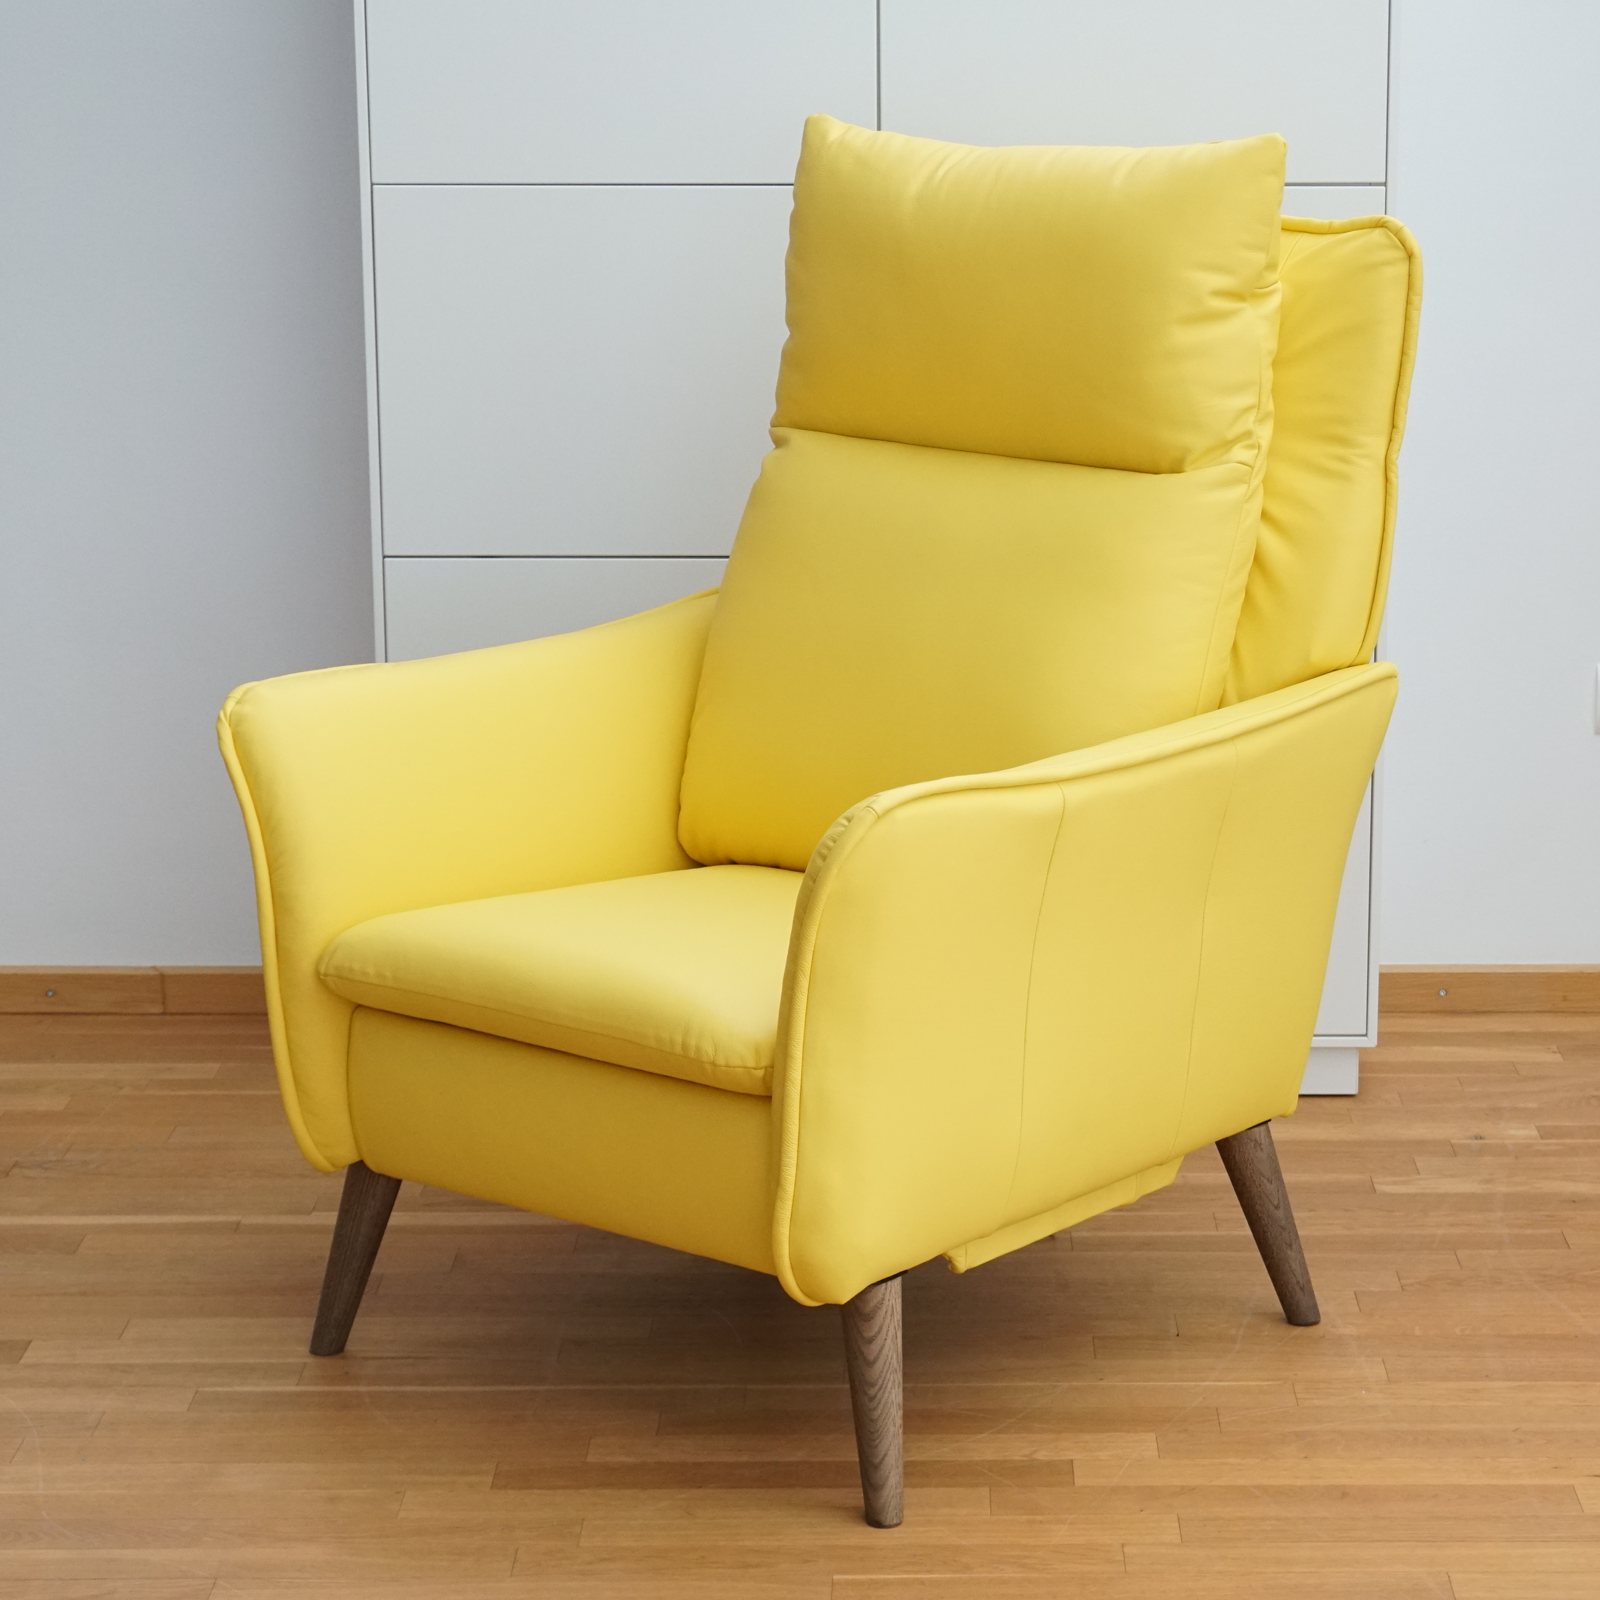 Wir Erfullen Unseren Kunden Fast Alle Wunsche Unseren Relaxsessel Insideout Haben Wir Soeben Als Sonderanfertigung Mit Extr Sessel Relaxsessel Fernsehsessel